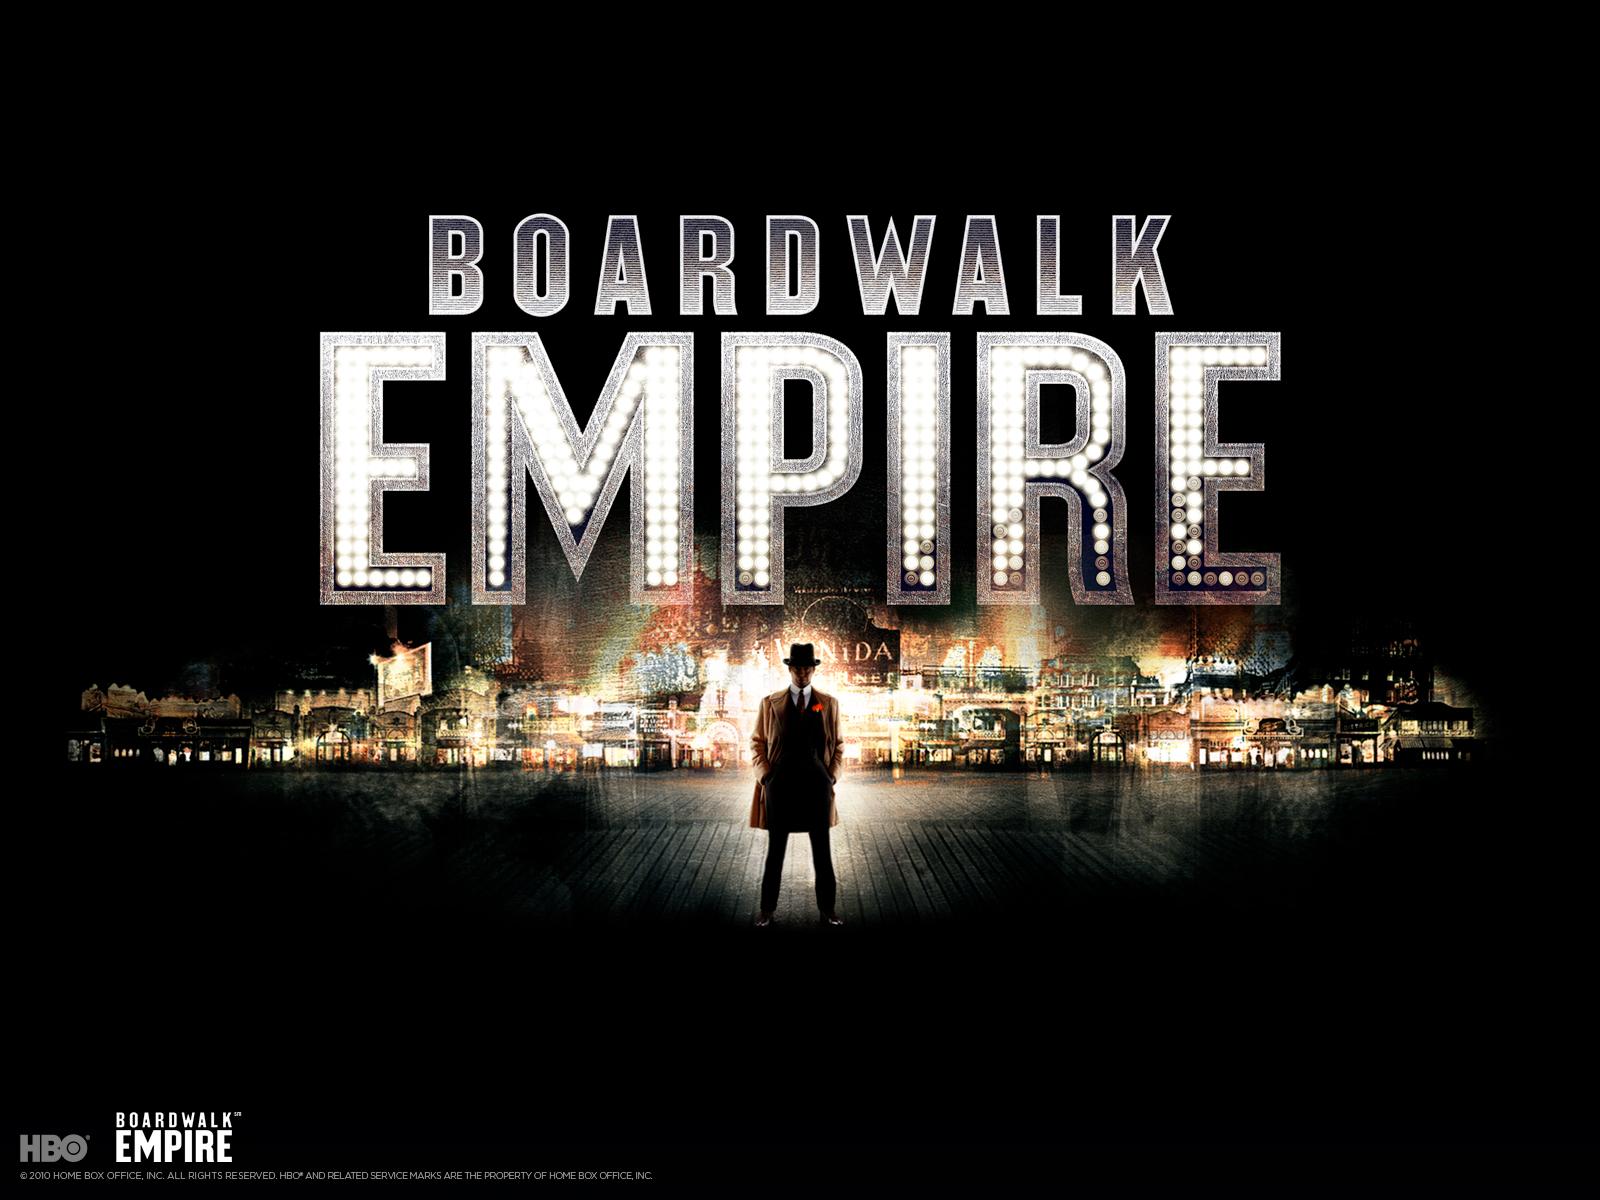 http://4.bp.blogspot.com/-ffgbrMQKuVU/TrEMq7aZLPI/AAAAAAAAAM8/TeuGmC2jnsc/s1600/boardwalk_empire_wallpaper_1600x1200_1.jpg